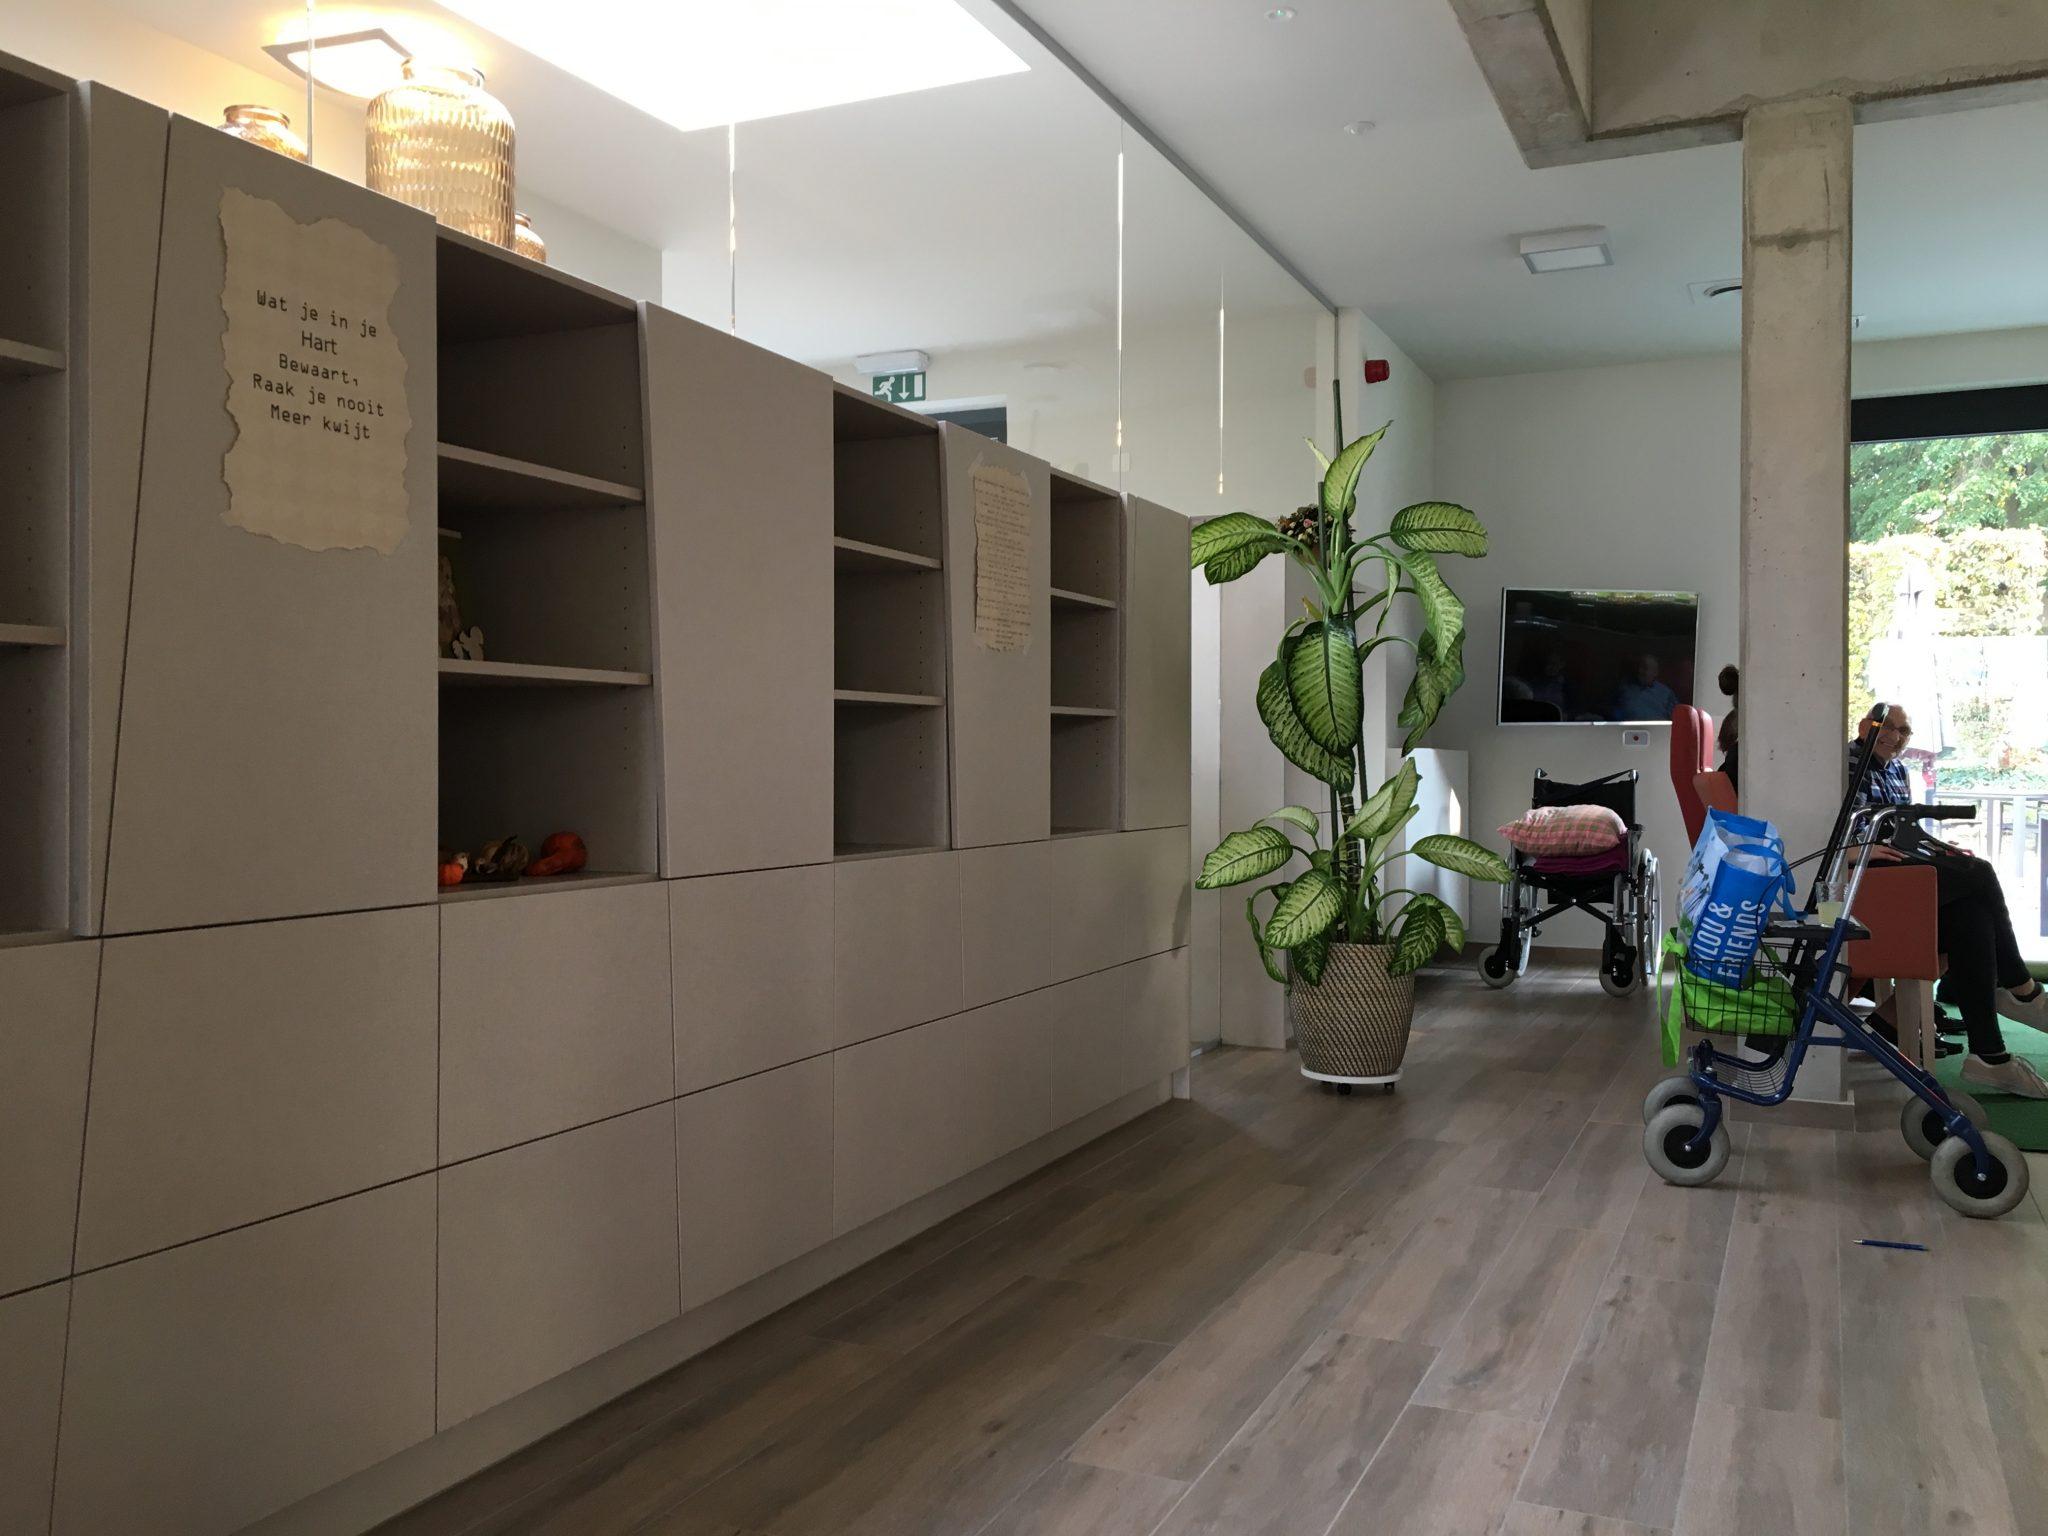 Kast Als Scheidingswand : Project woonzorgcentrum ocura ozen interieur